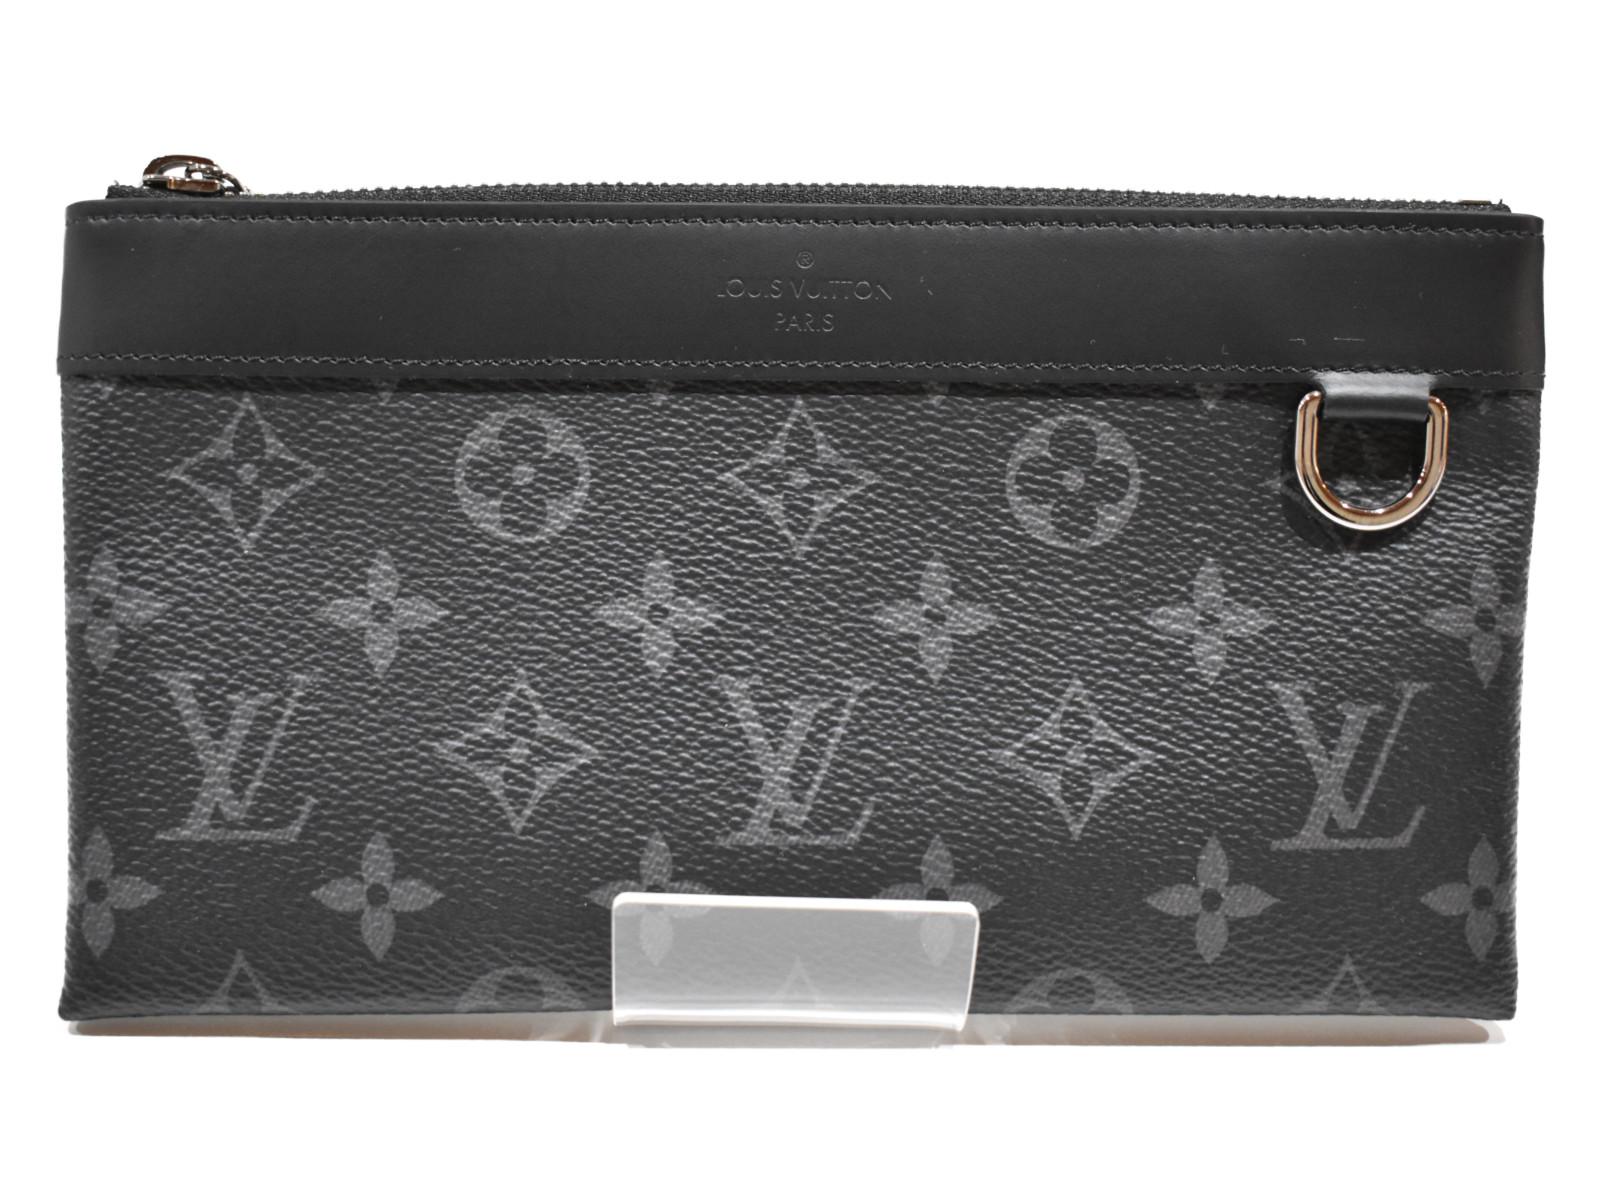 LOUIS VUITTONポシェット・ディスカバリーPM M4433 エクリプス メンズ ポーチ ユニセックス プレゼント包装可【中古】